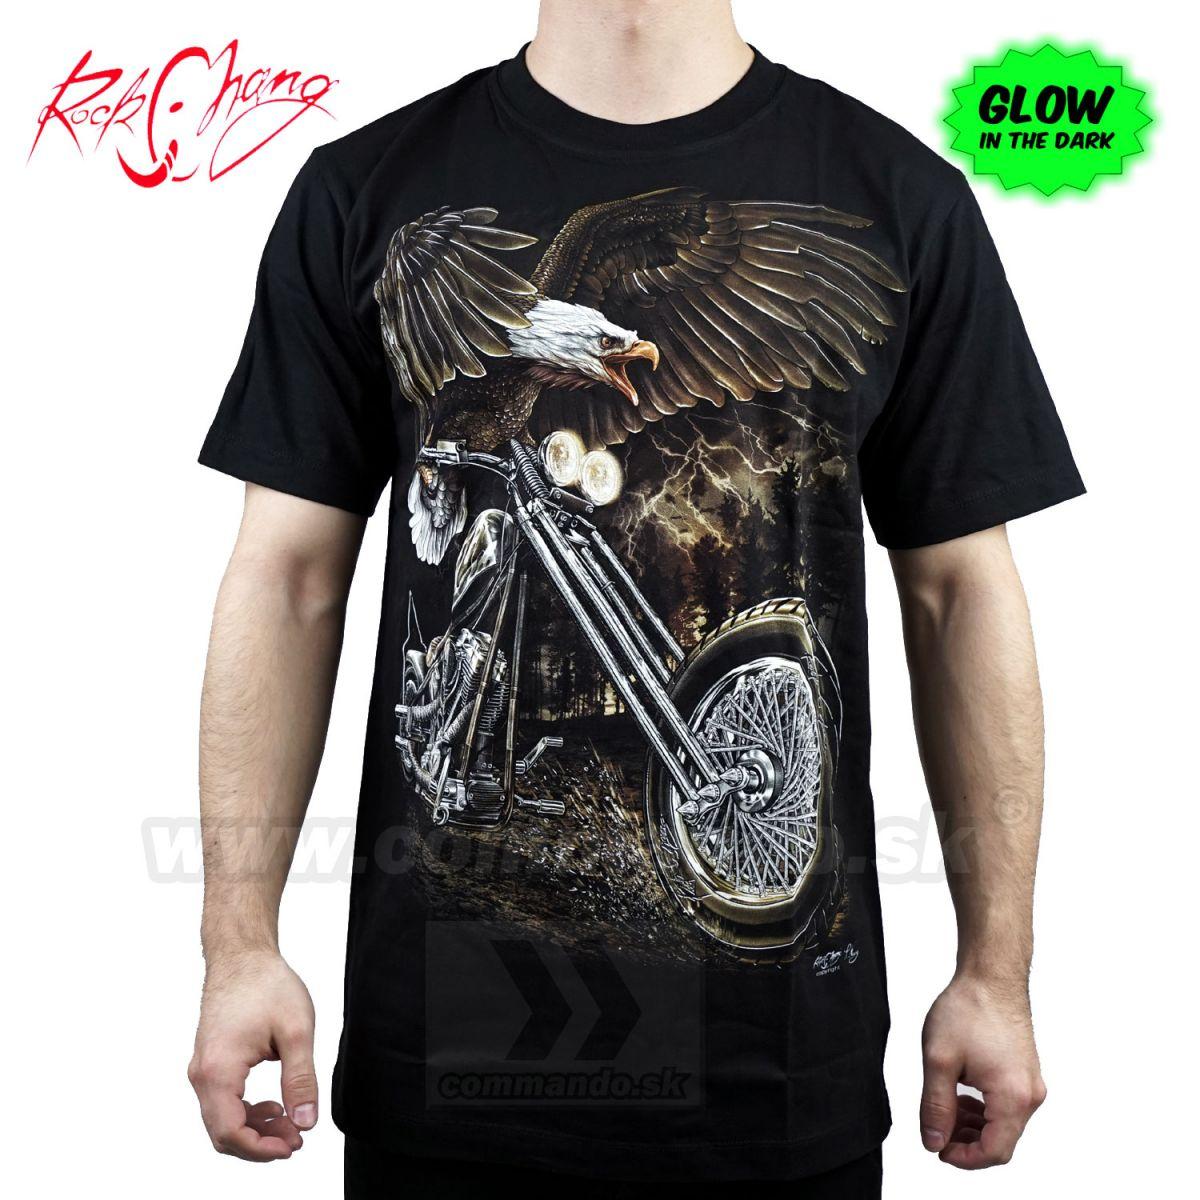 d704da4cf886 Tričko Eagle Free Rider Rock Chang GR737 T-Shirt